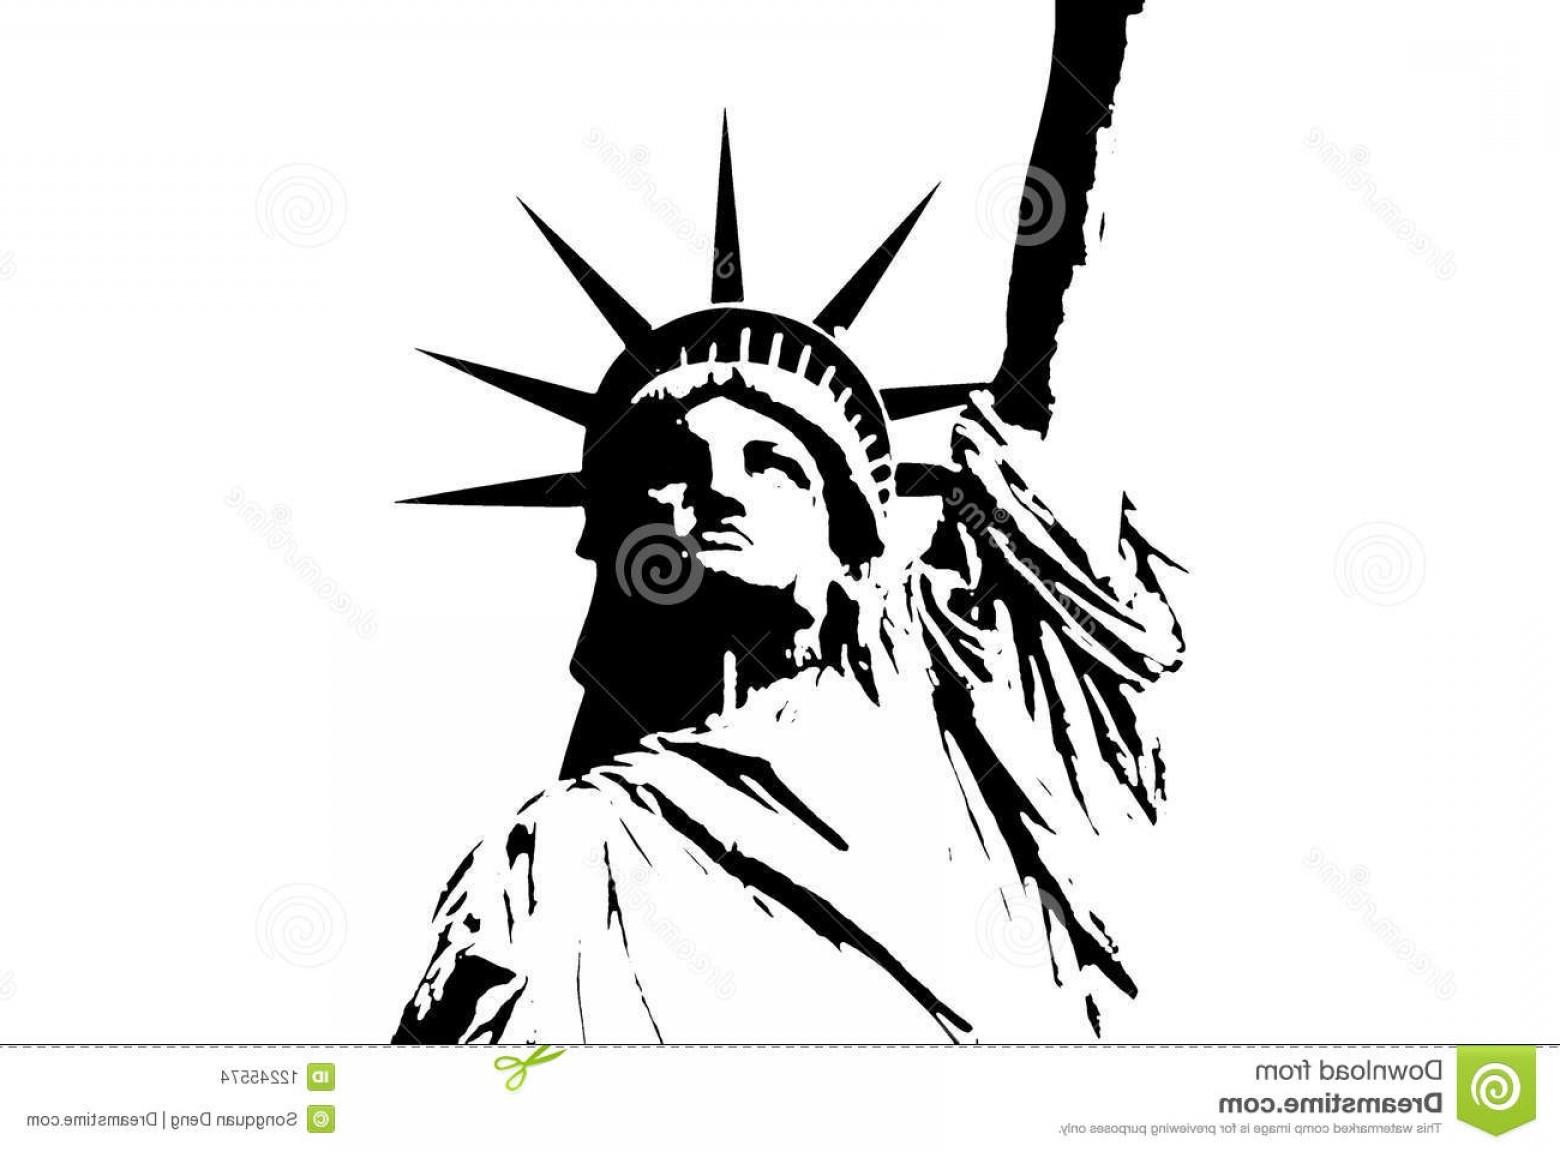 1560x1152 Stock Images New York City Statue Liberty Image Lazttweet